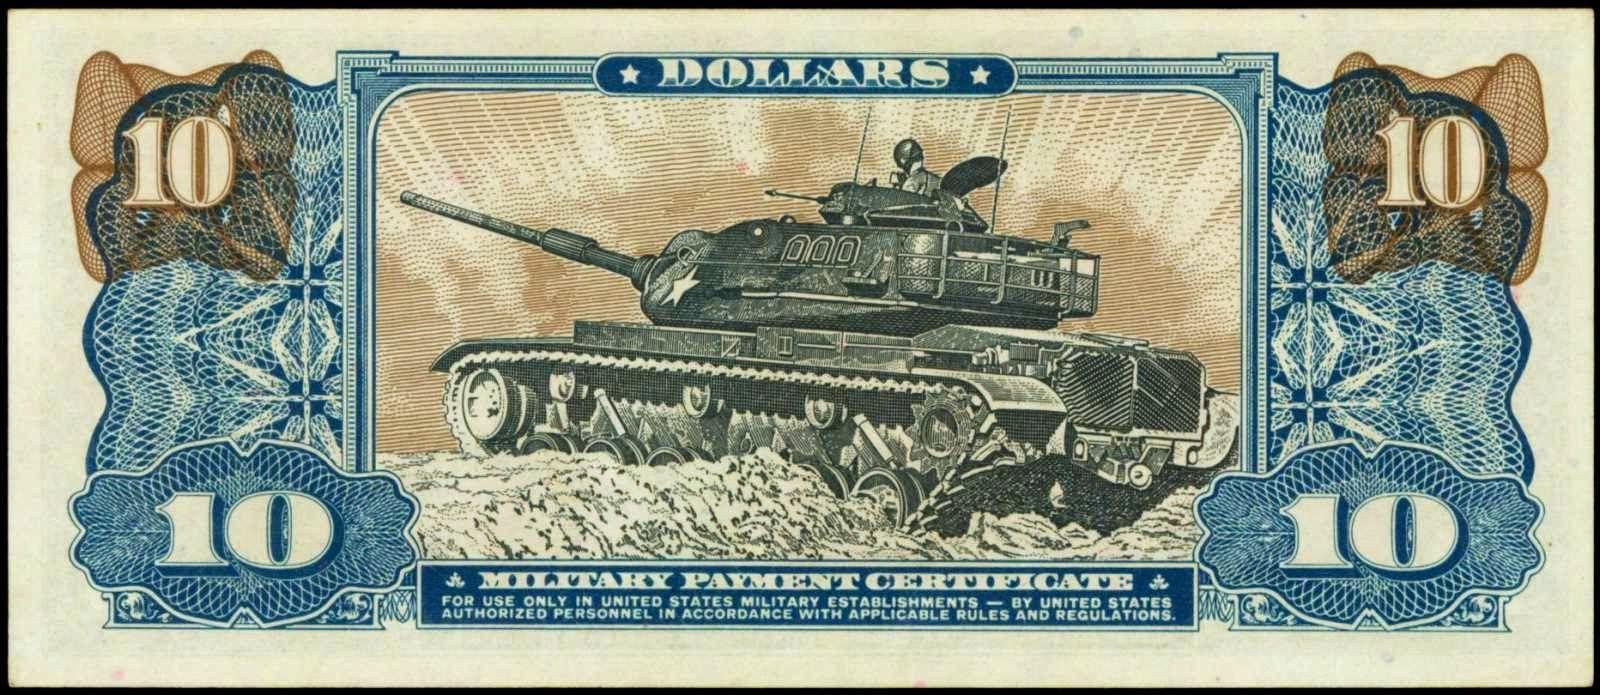 10 Dollars Military Payment Certificate Us Mpc Series 681 Vietnam